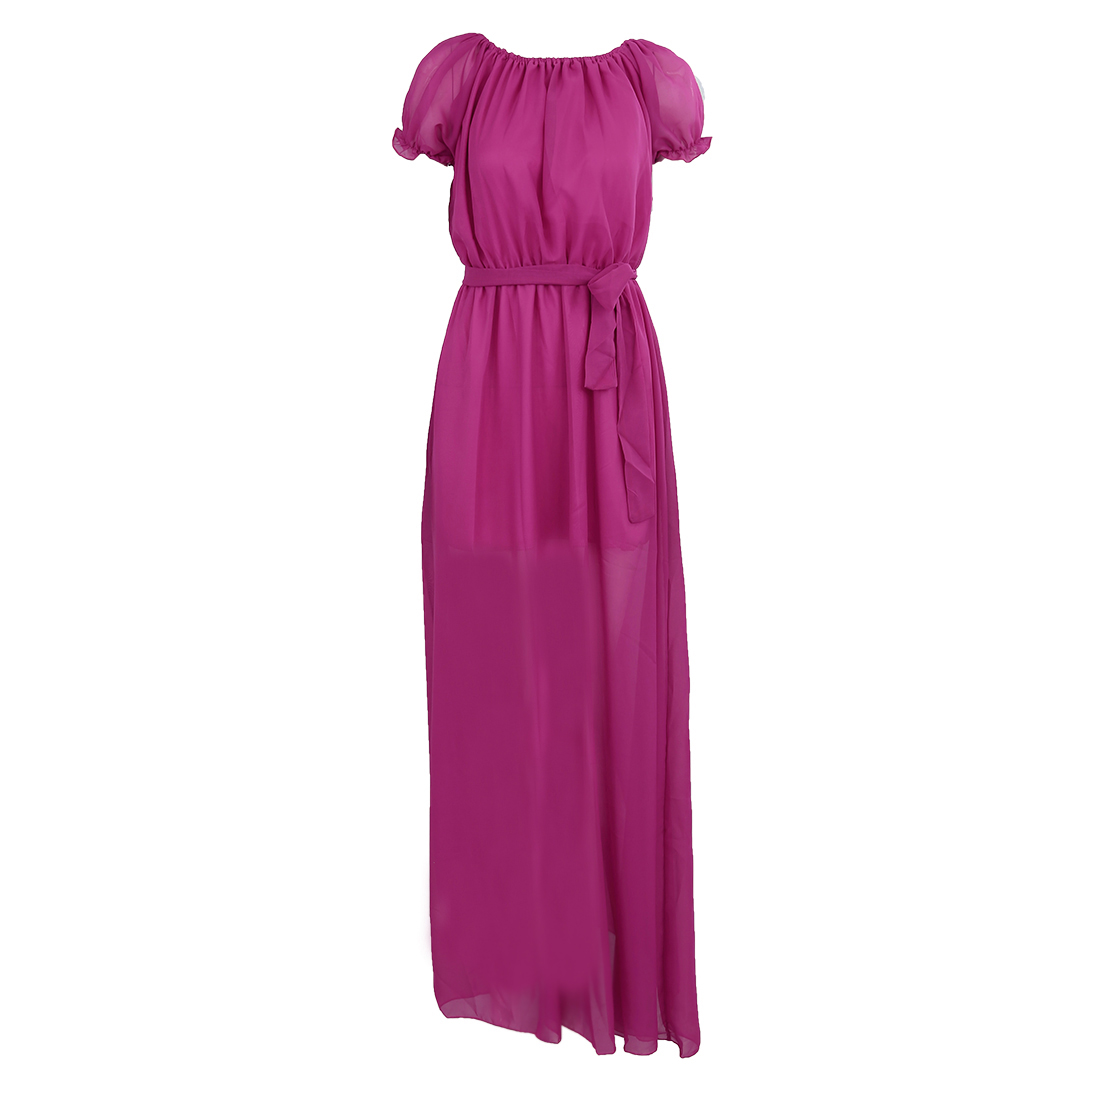 Promoción de Tubo Púrpura Vestido - Compra Tubo P&uacute ...